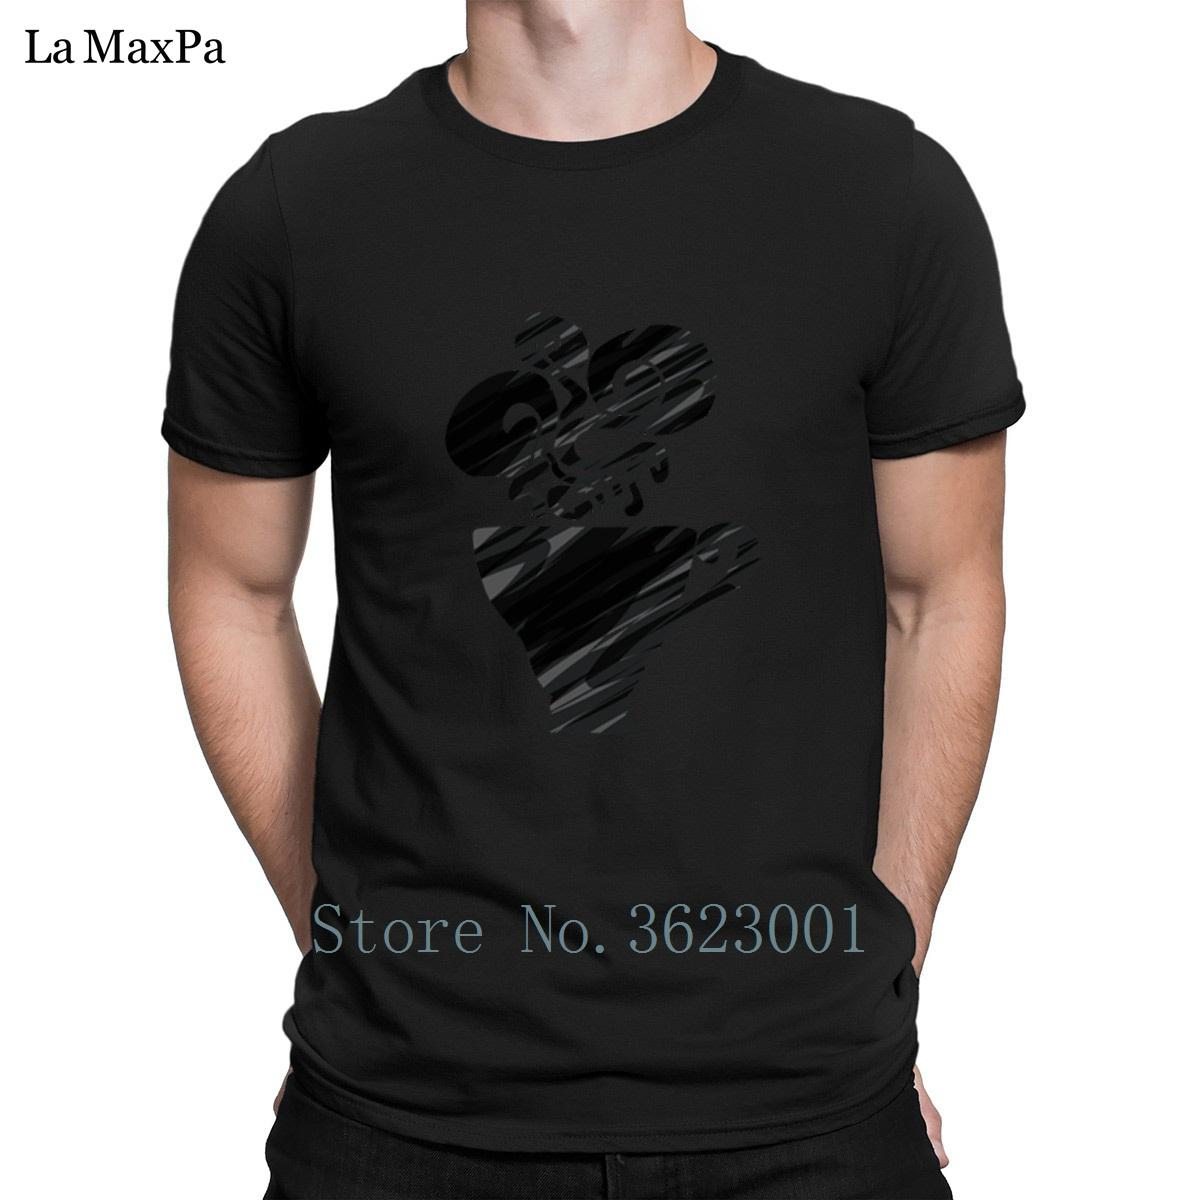 Klassische T Sie Großhandel Shirt Herren Erstellen Tee Schwarzer 4gnqE